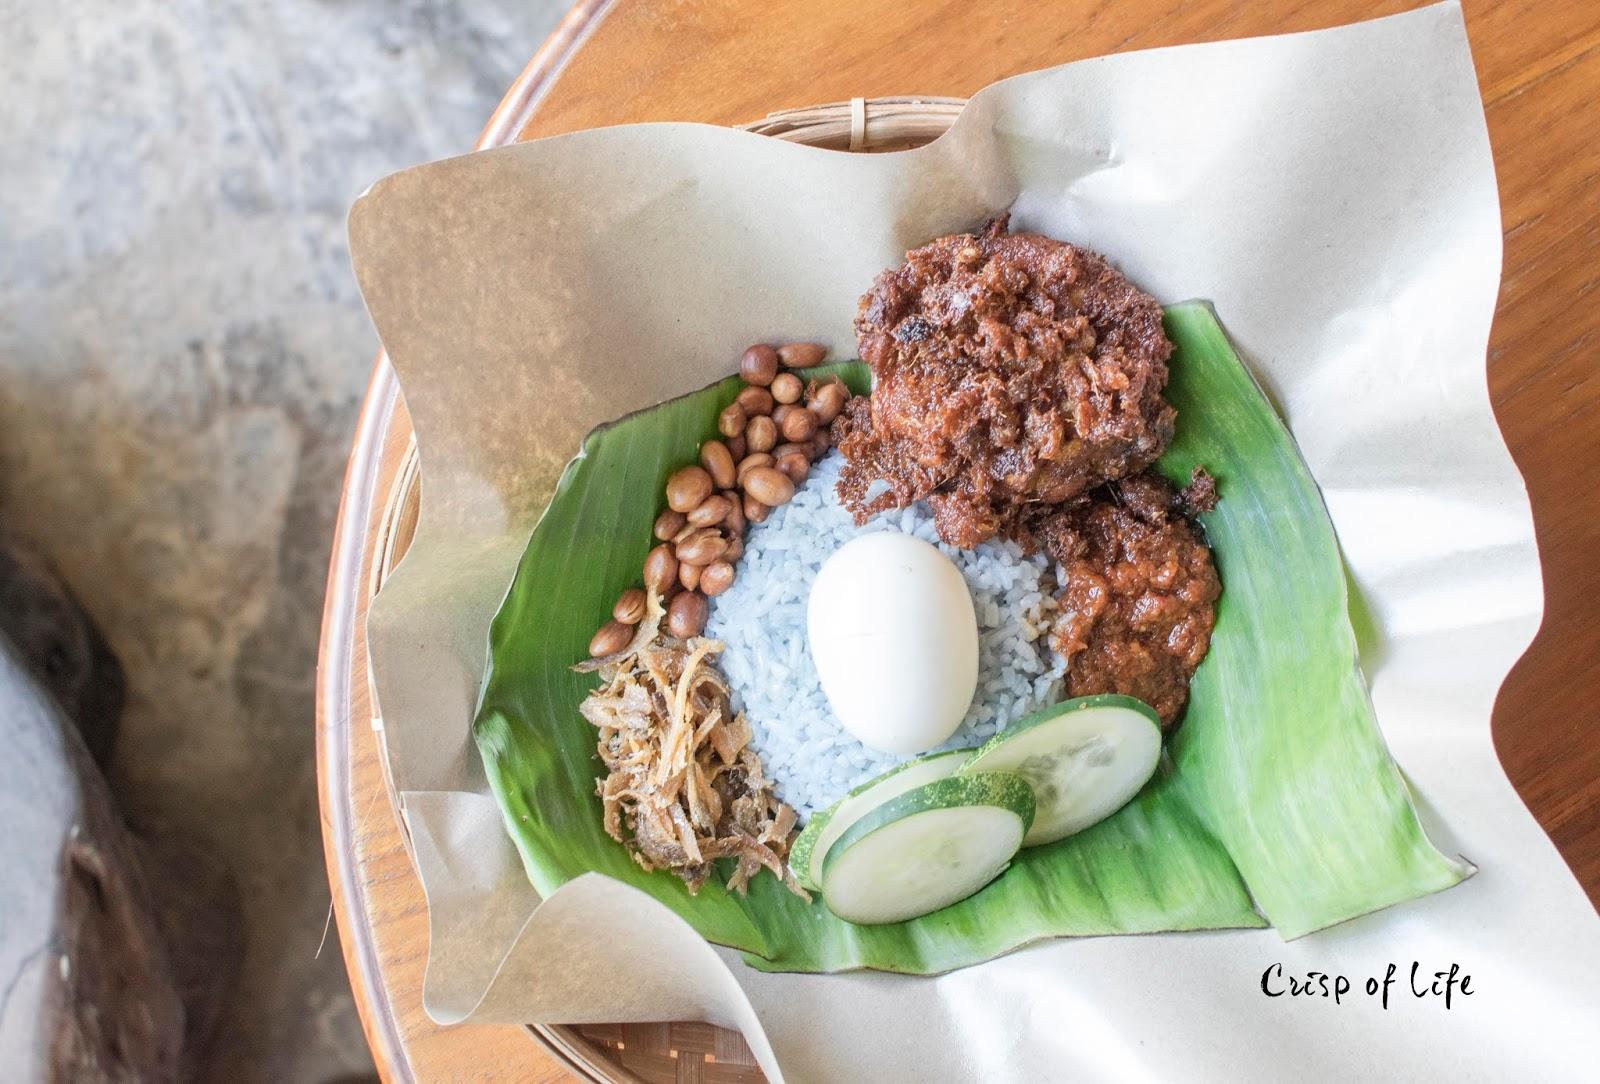 Art Sim Kitchen Tanjung Bungah Nasi Lemak Penang